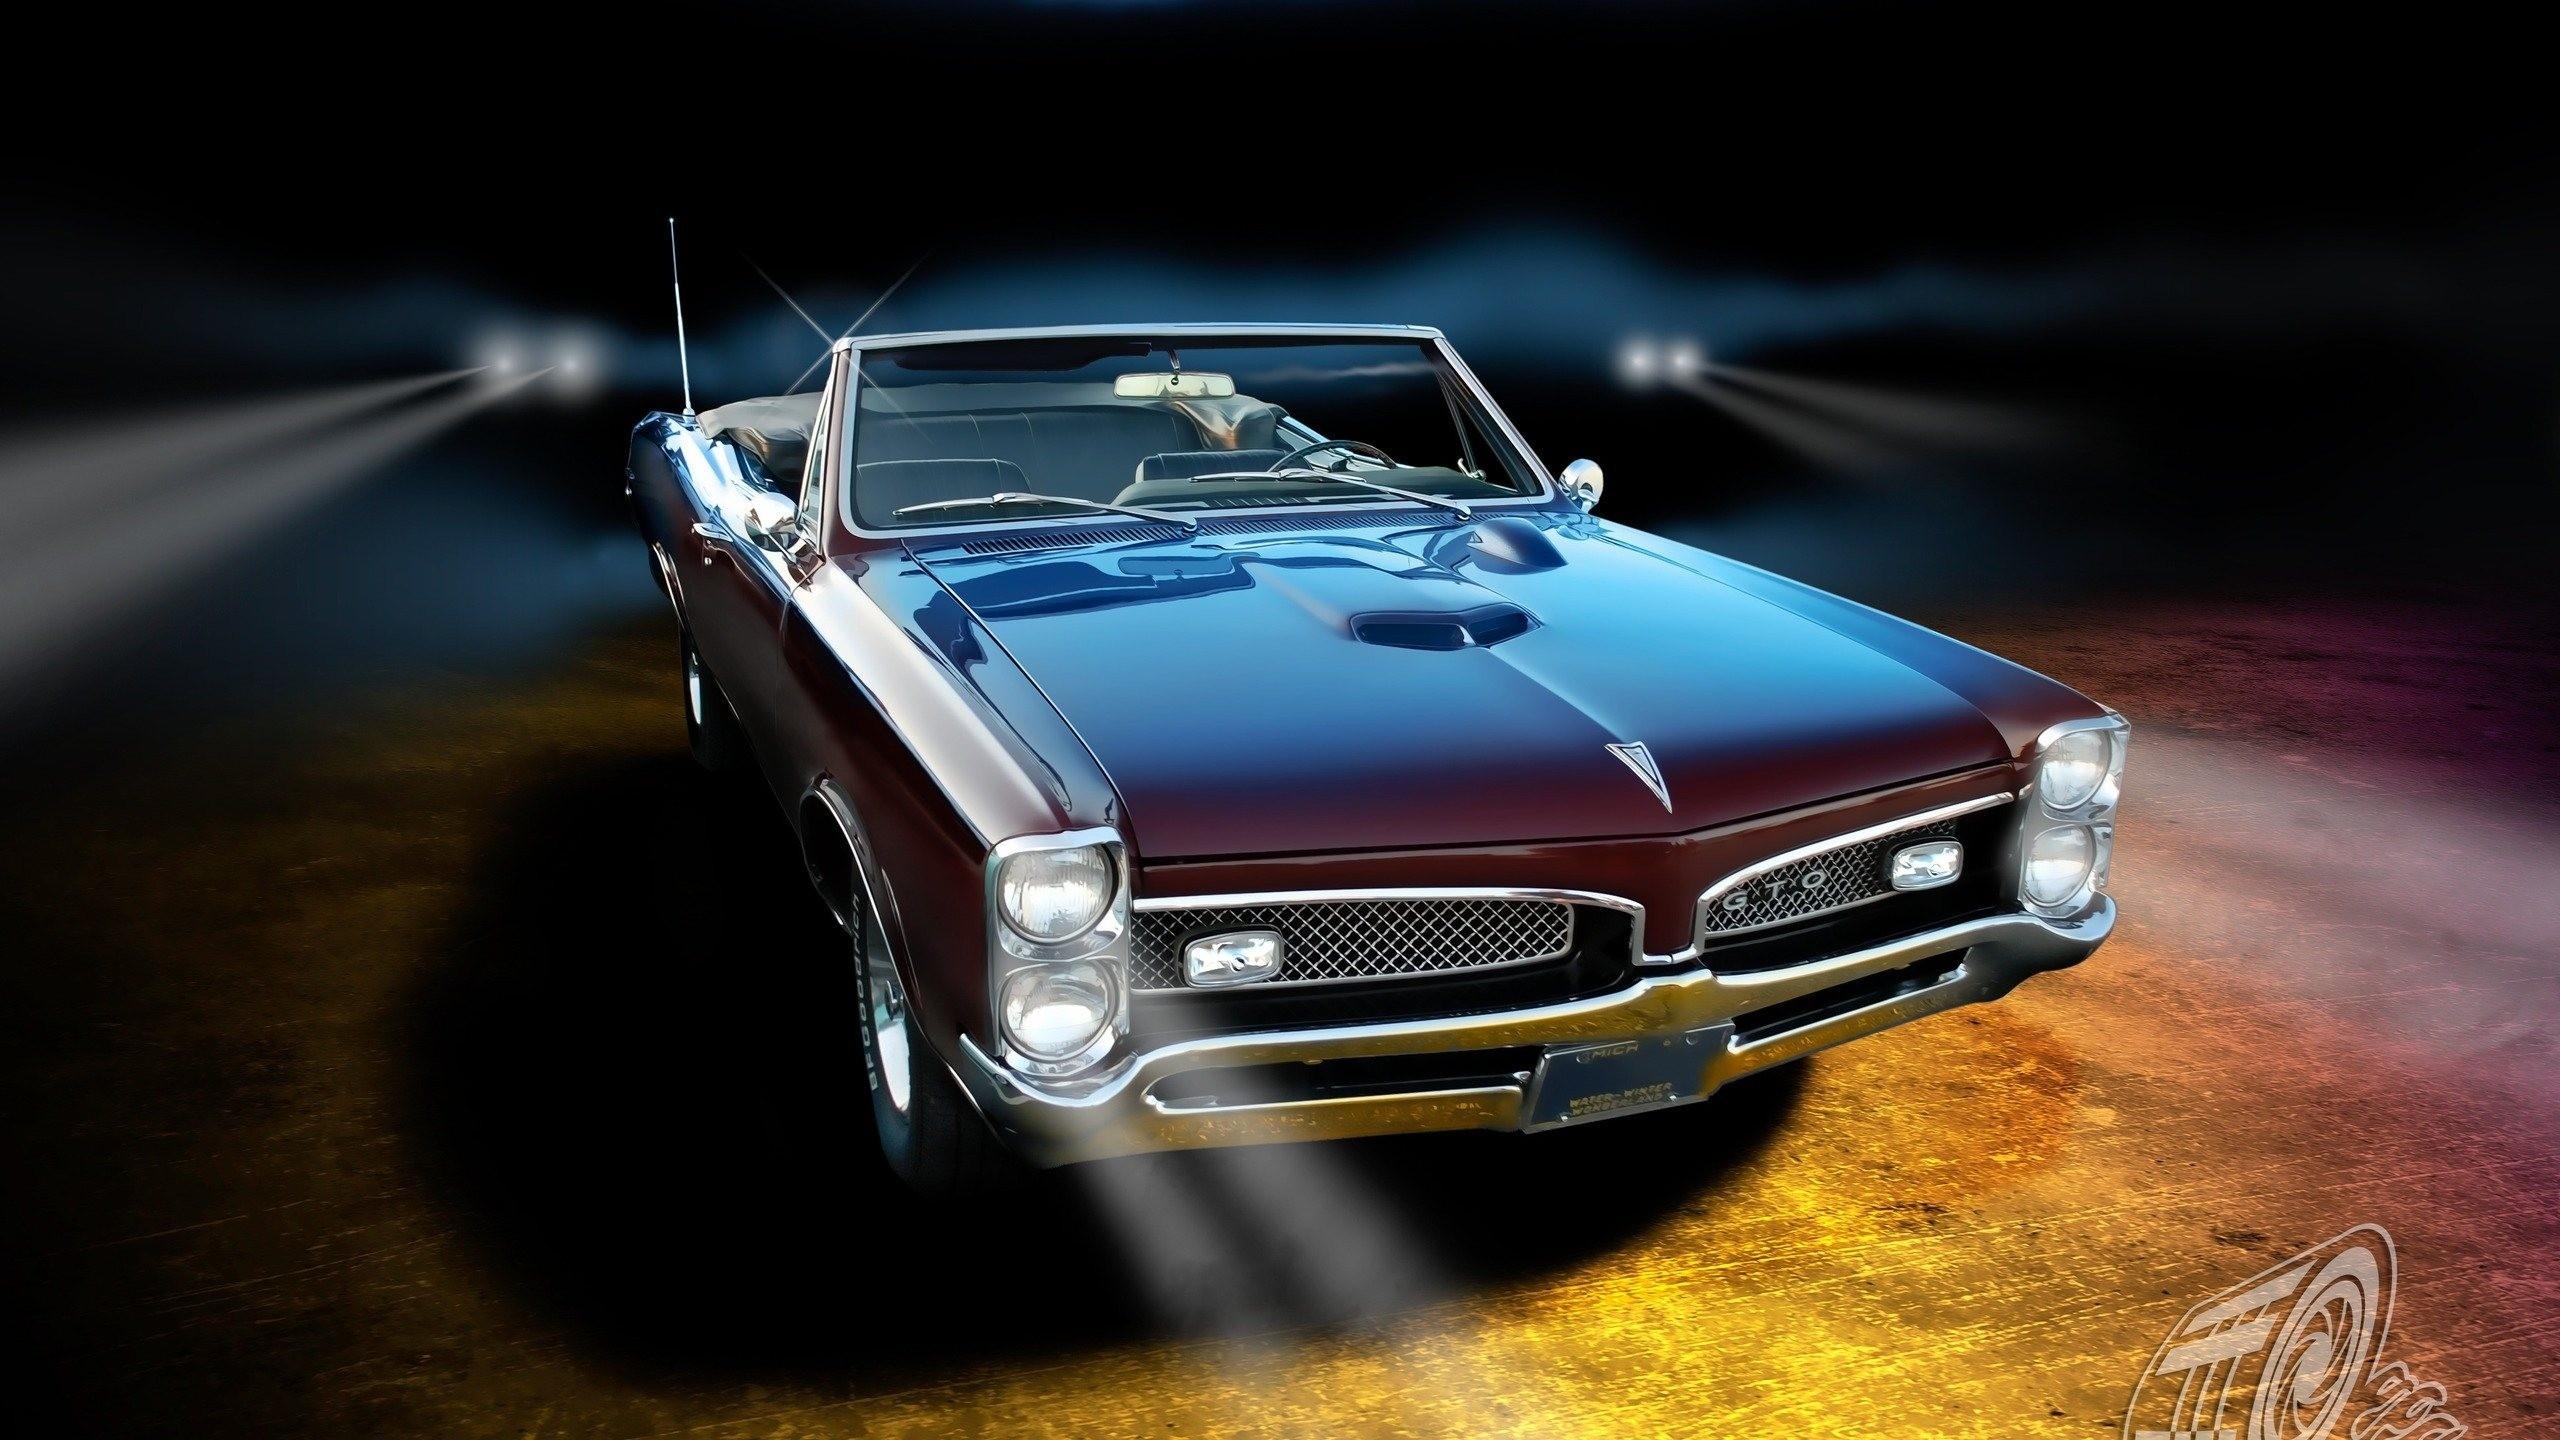 Pontiac GTO classic muscle cars wallpaper 2560x1440 2560x1440